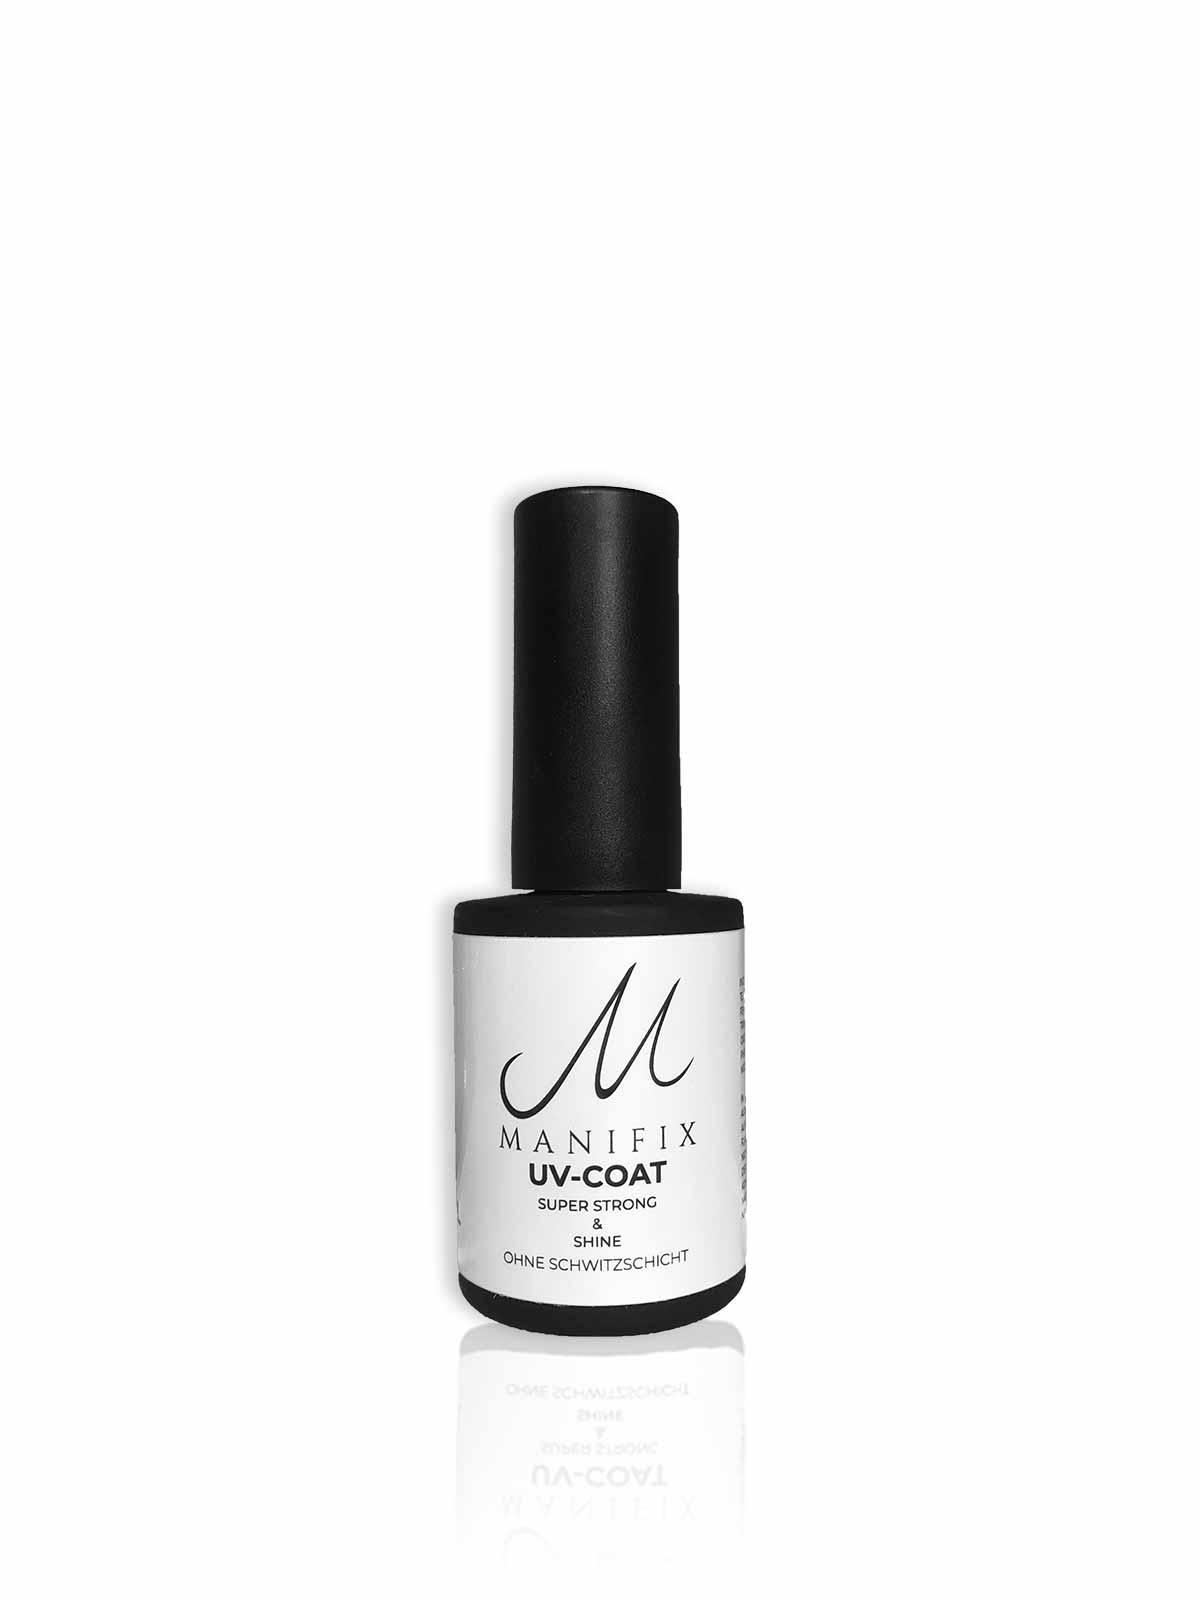 Manifix UVCoat Produkt free 1